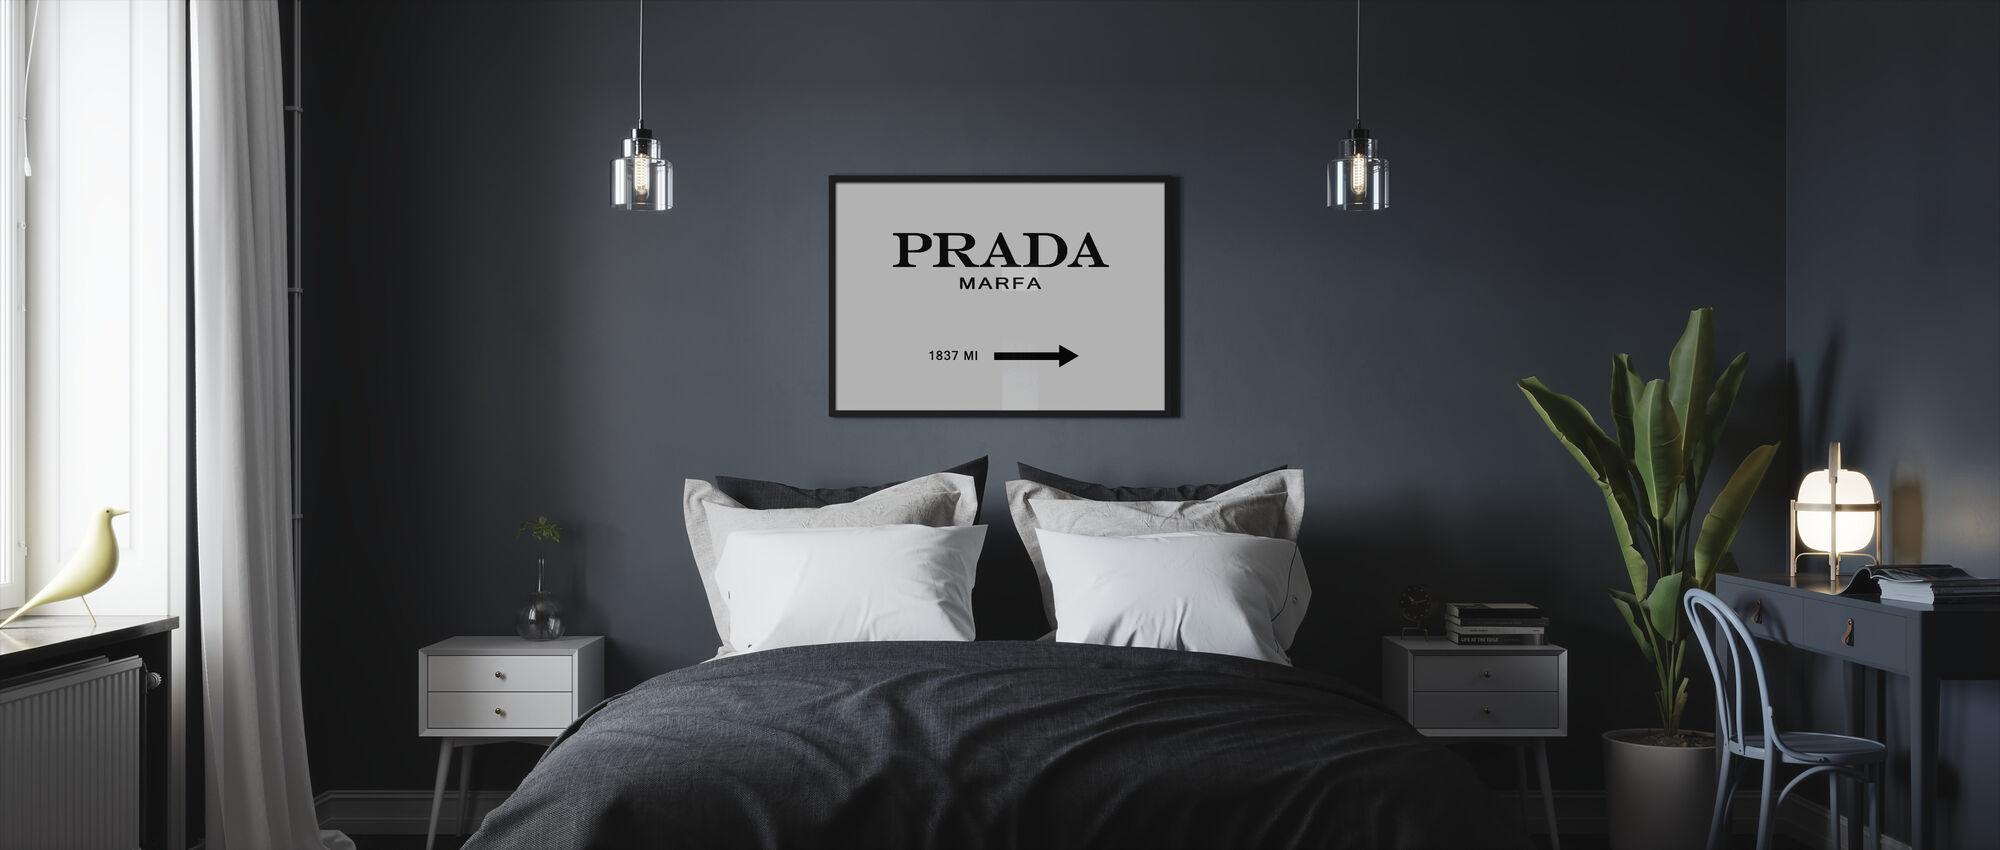 Prada Marfa - Framed print - Bedroom